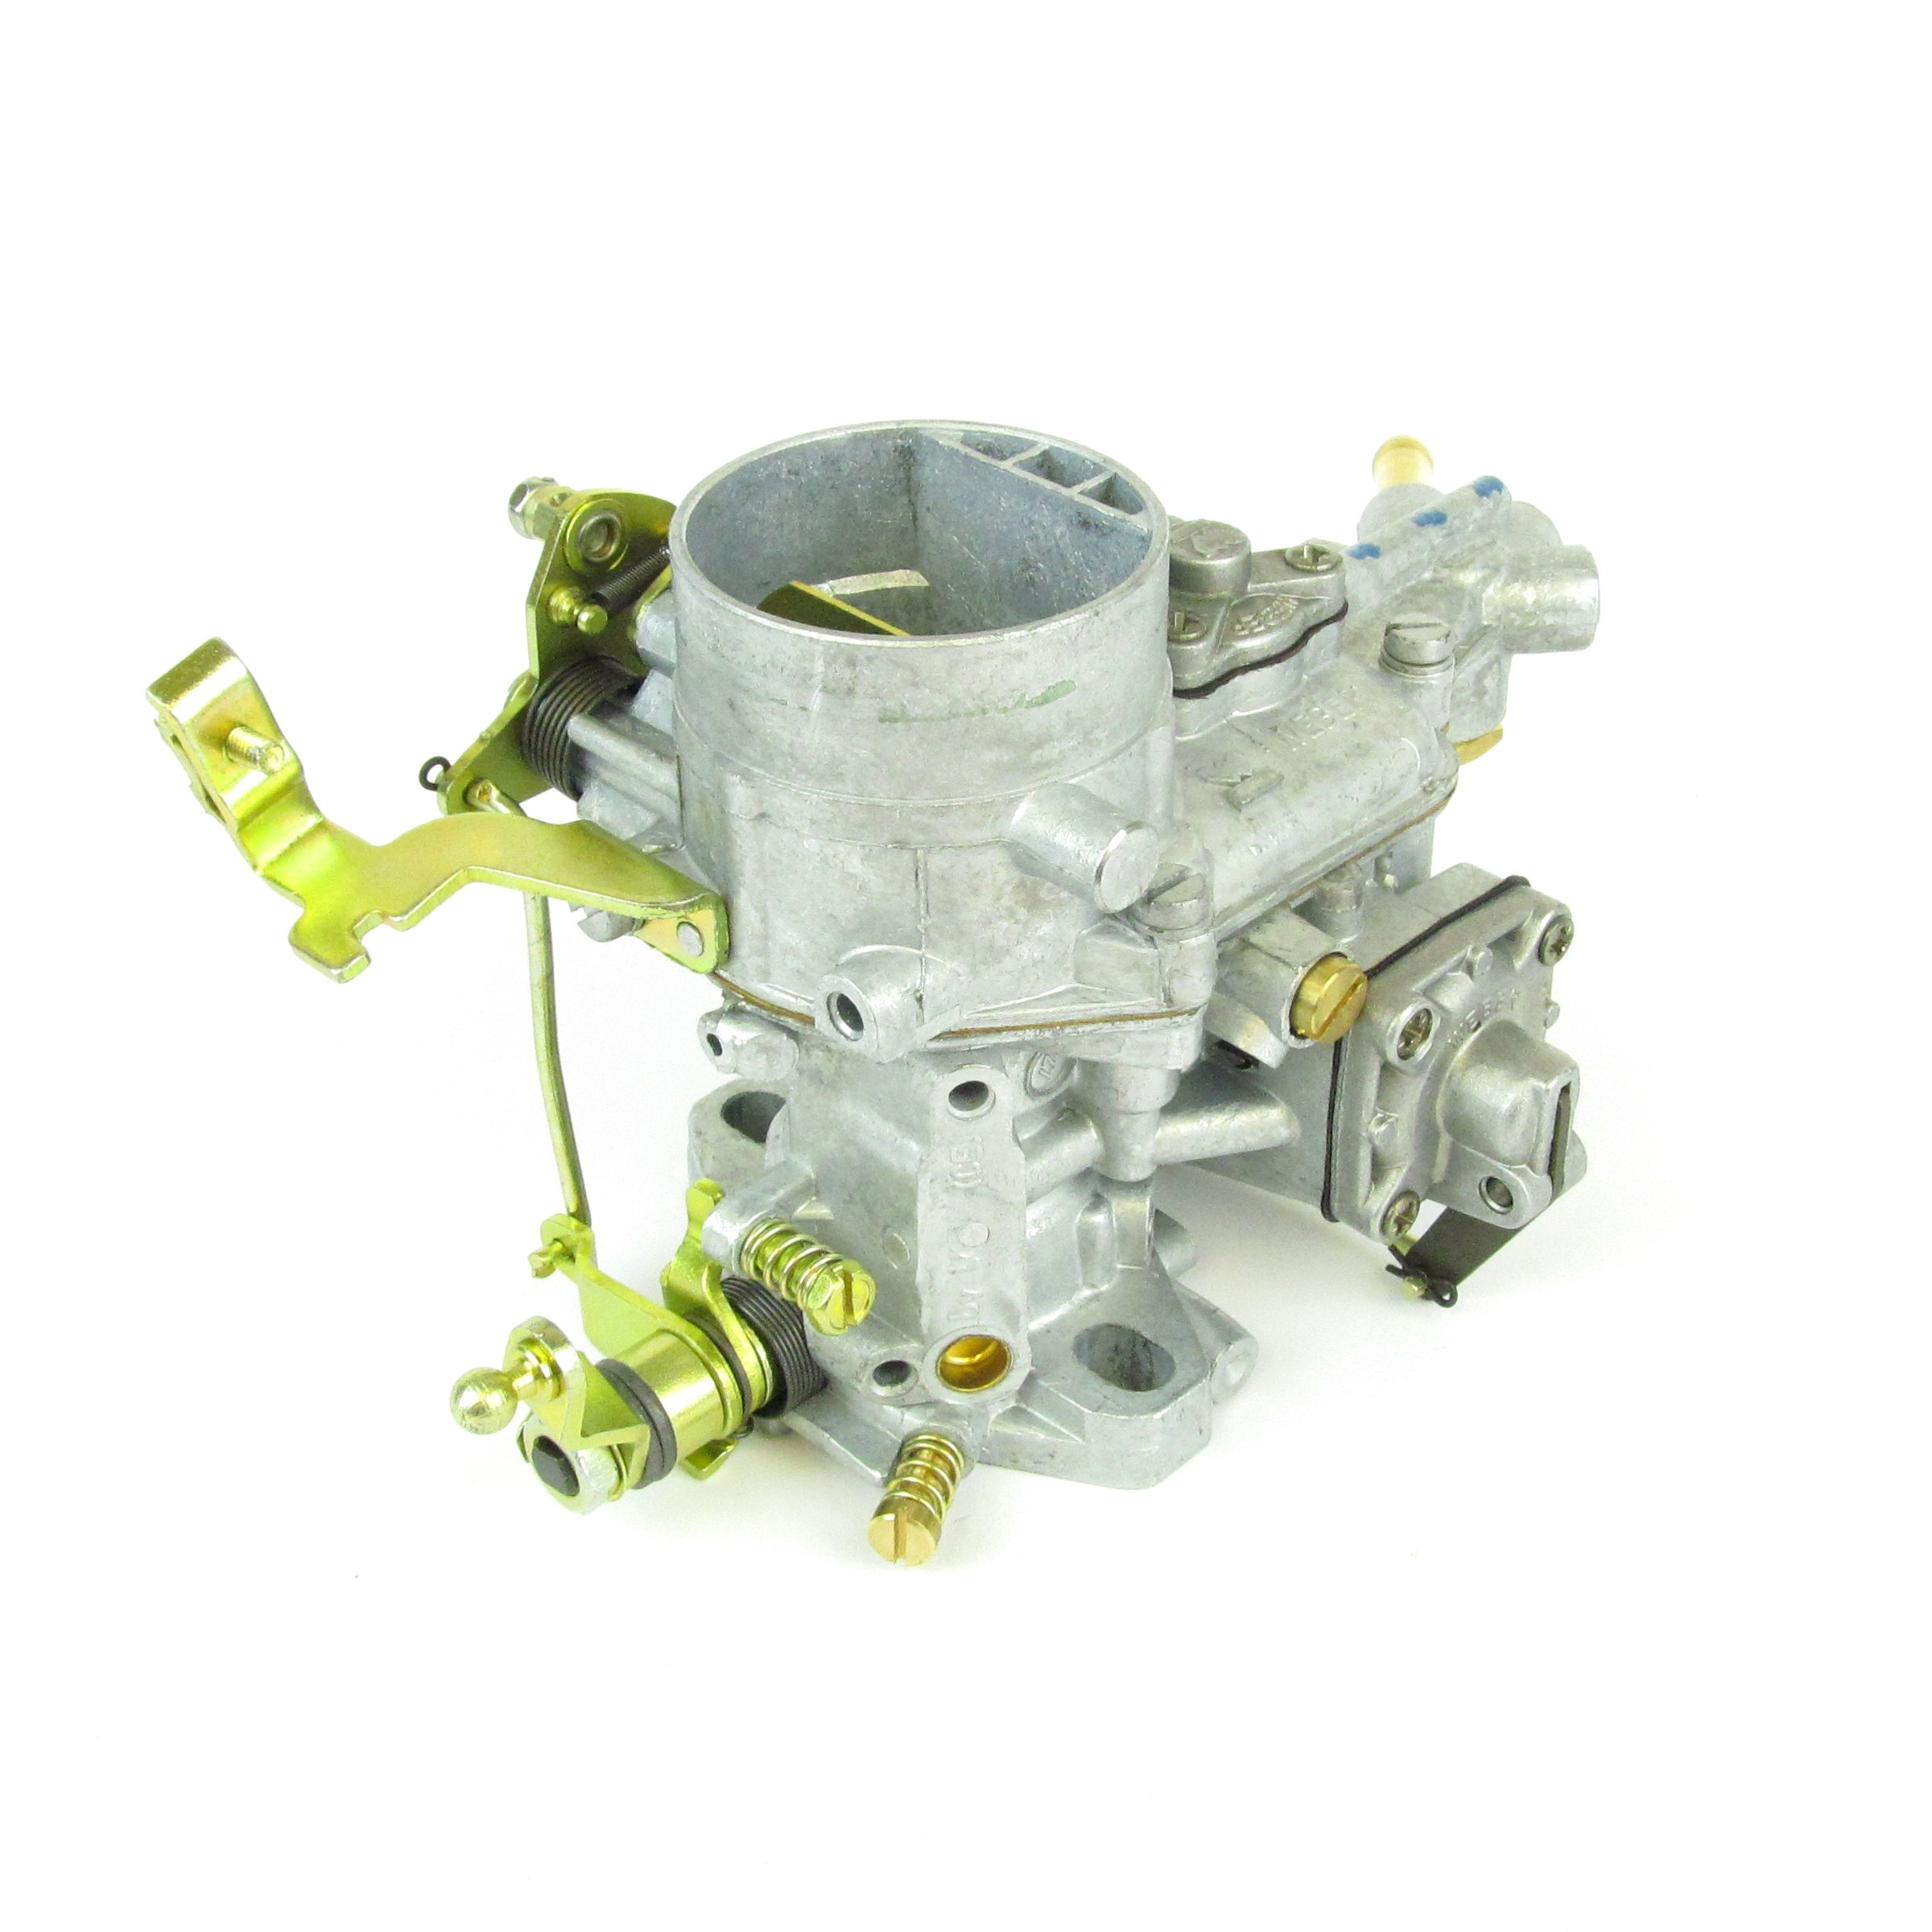 WEBER 34 ICH CARBURETOR UPGRADE KIT SAAB 95 / 96 V4 1498CC FORD TAUNUS ENGINE